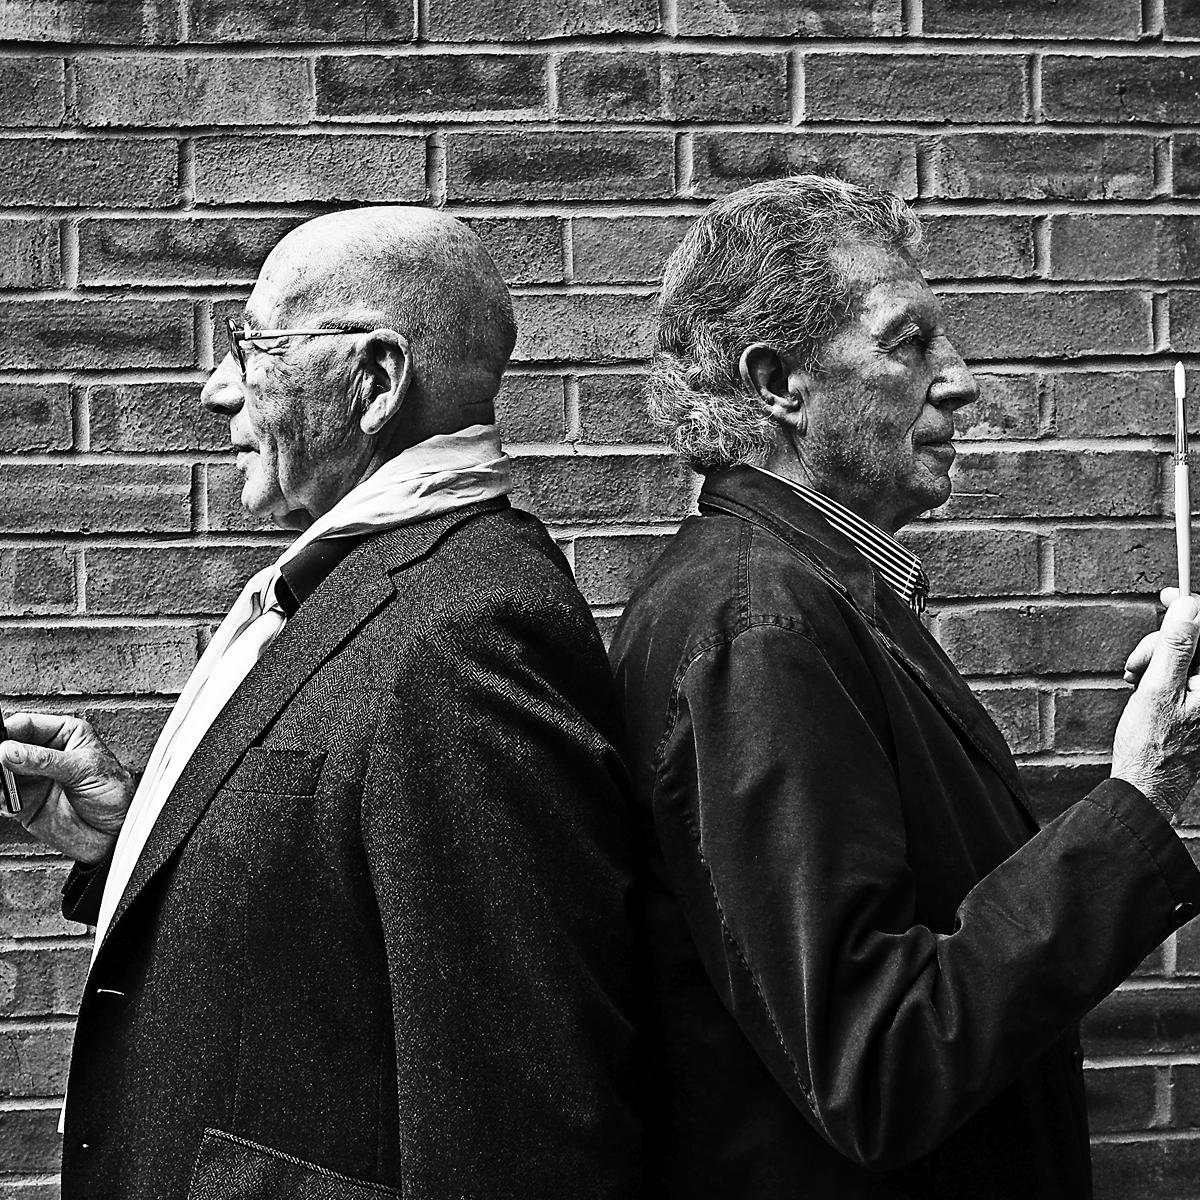 Portrait of Tony Brignull and Neil Godfrey by Fine Art Photographer Julian Hanford, London